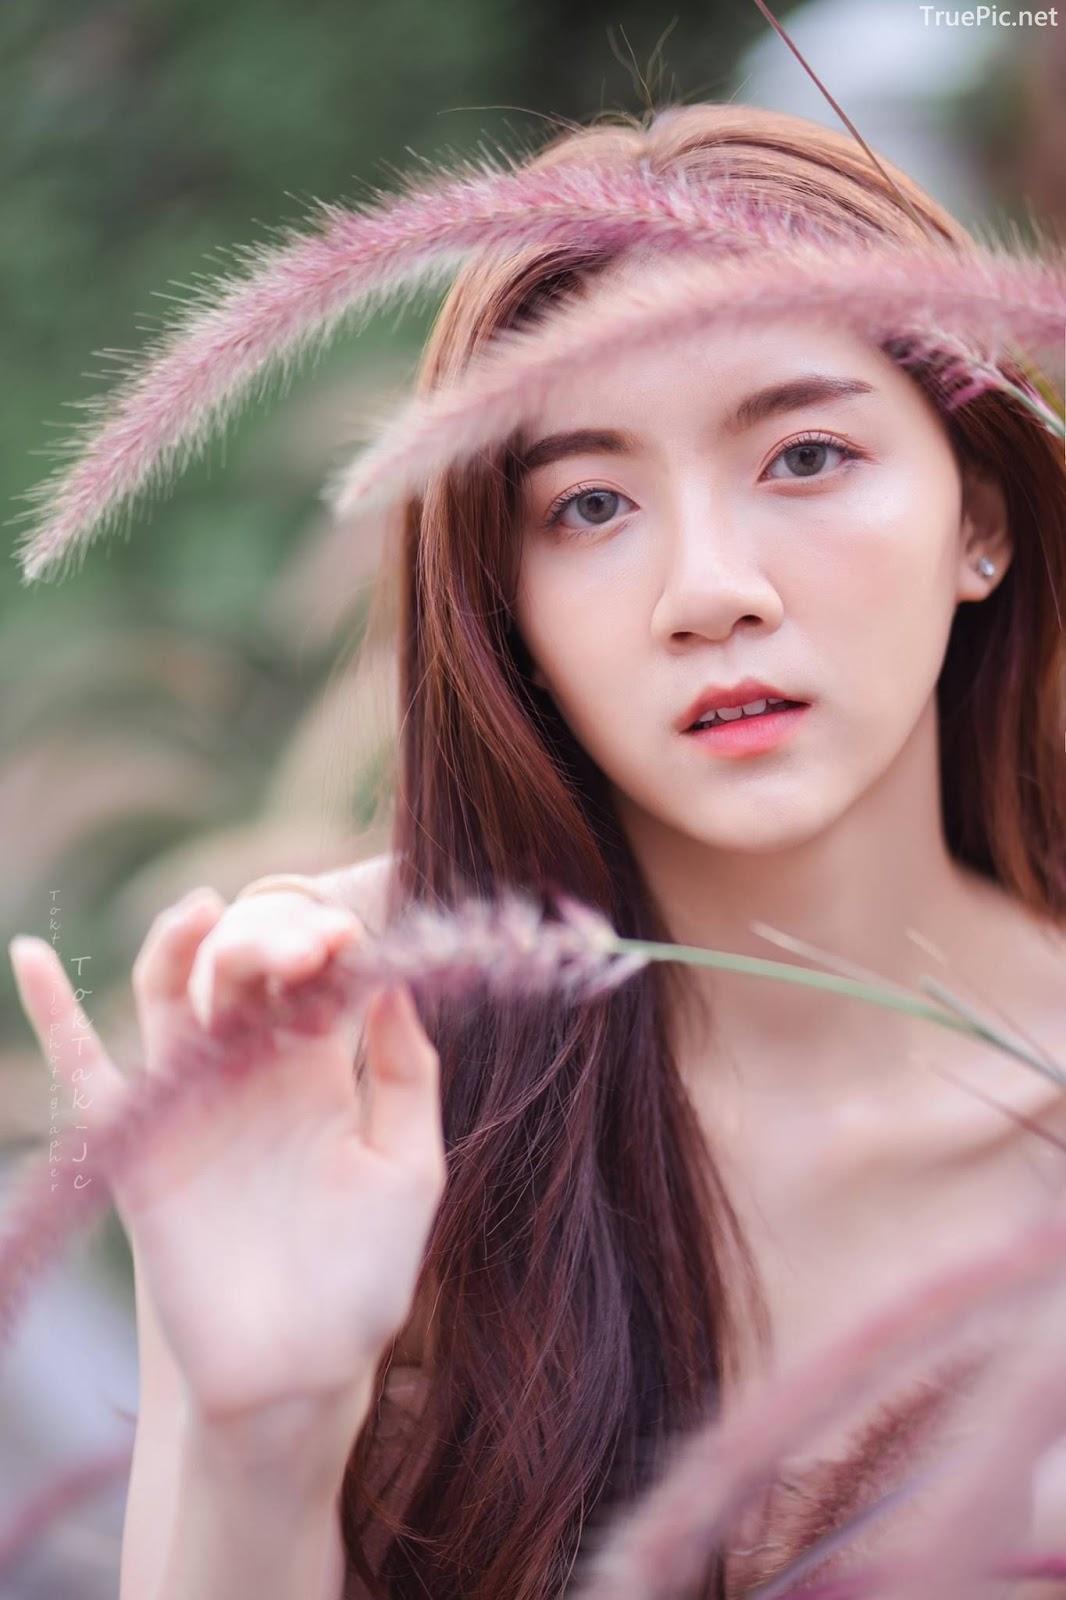 Thailand angel model Sasi Ngiunwan - Beauty portrait photoshoot - Picture 3